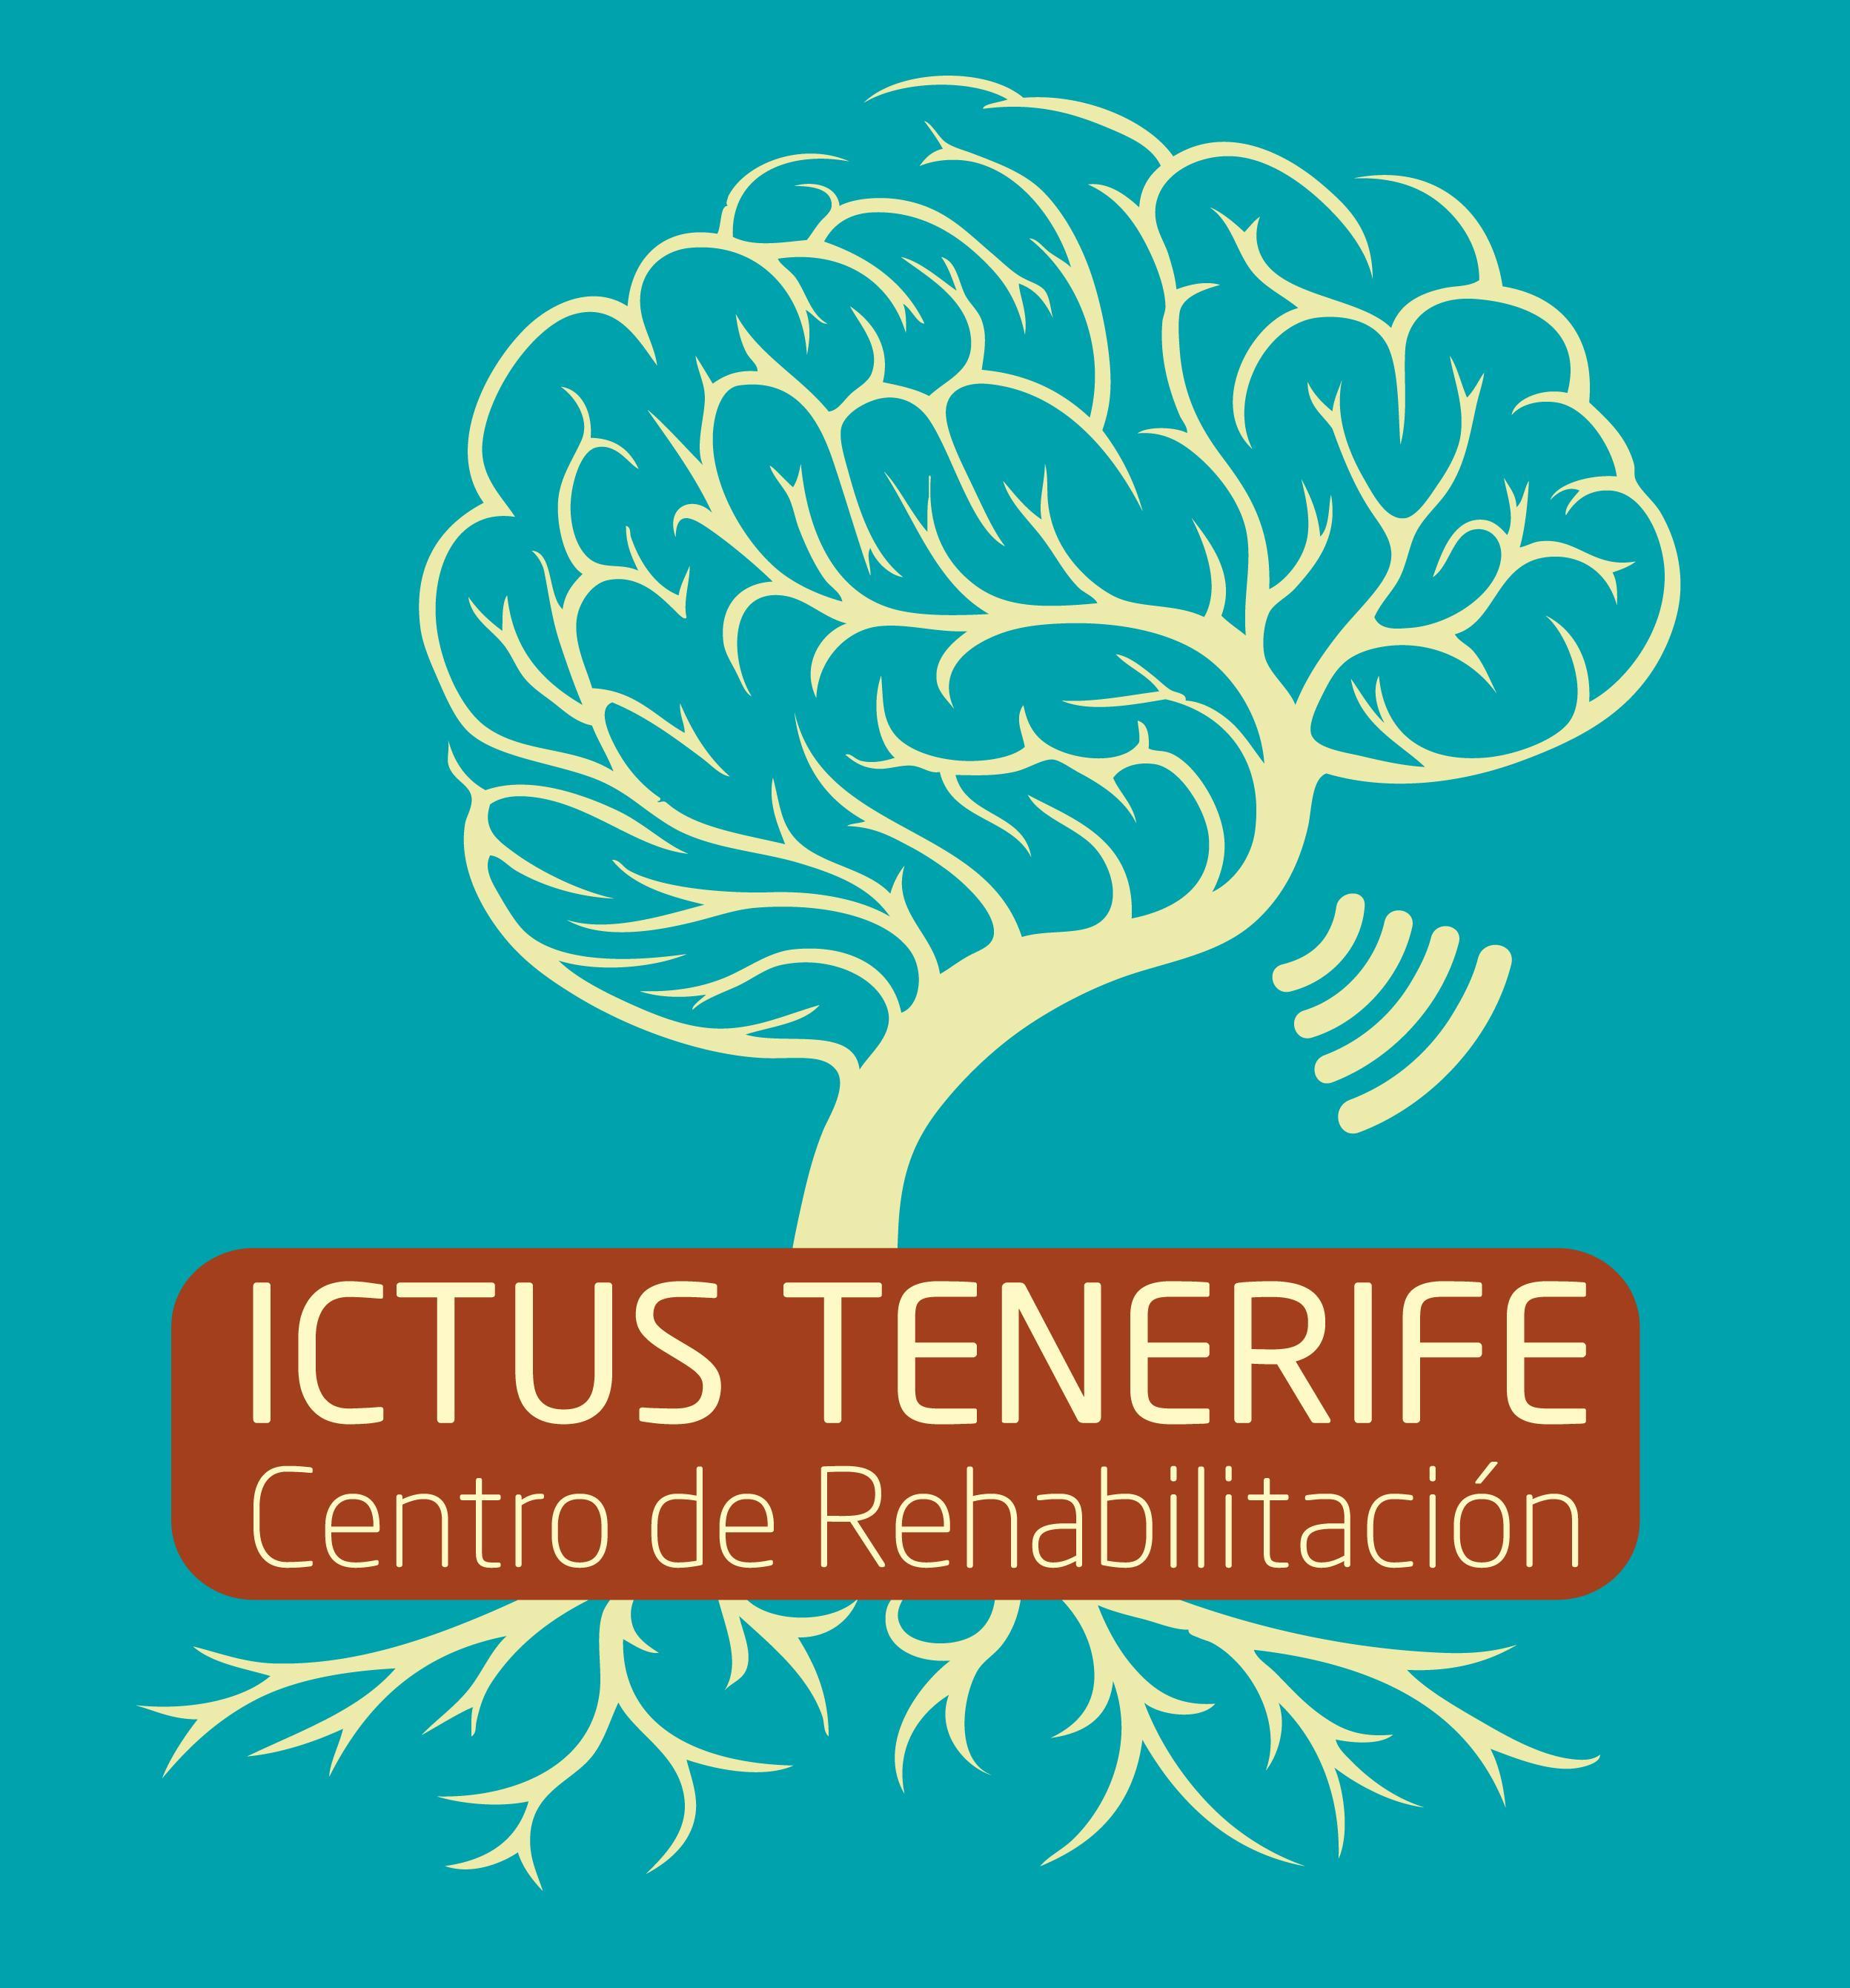 ICTUS Tenerife